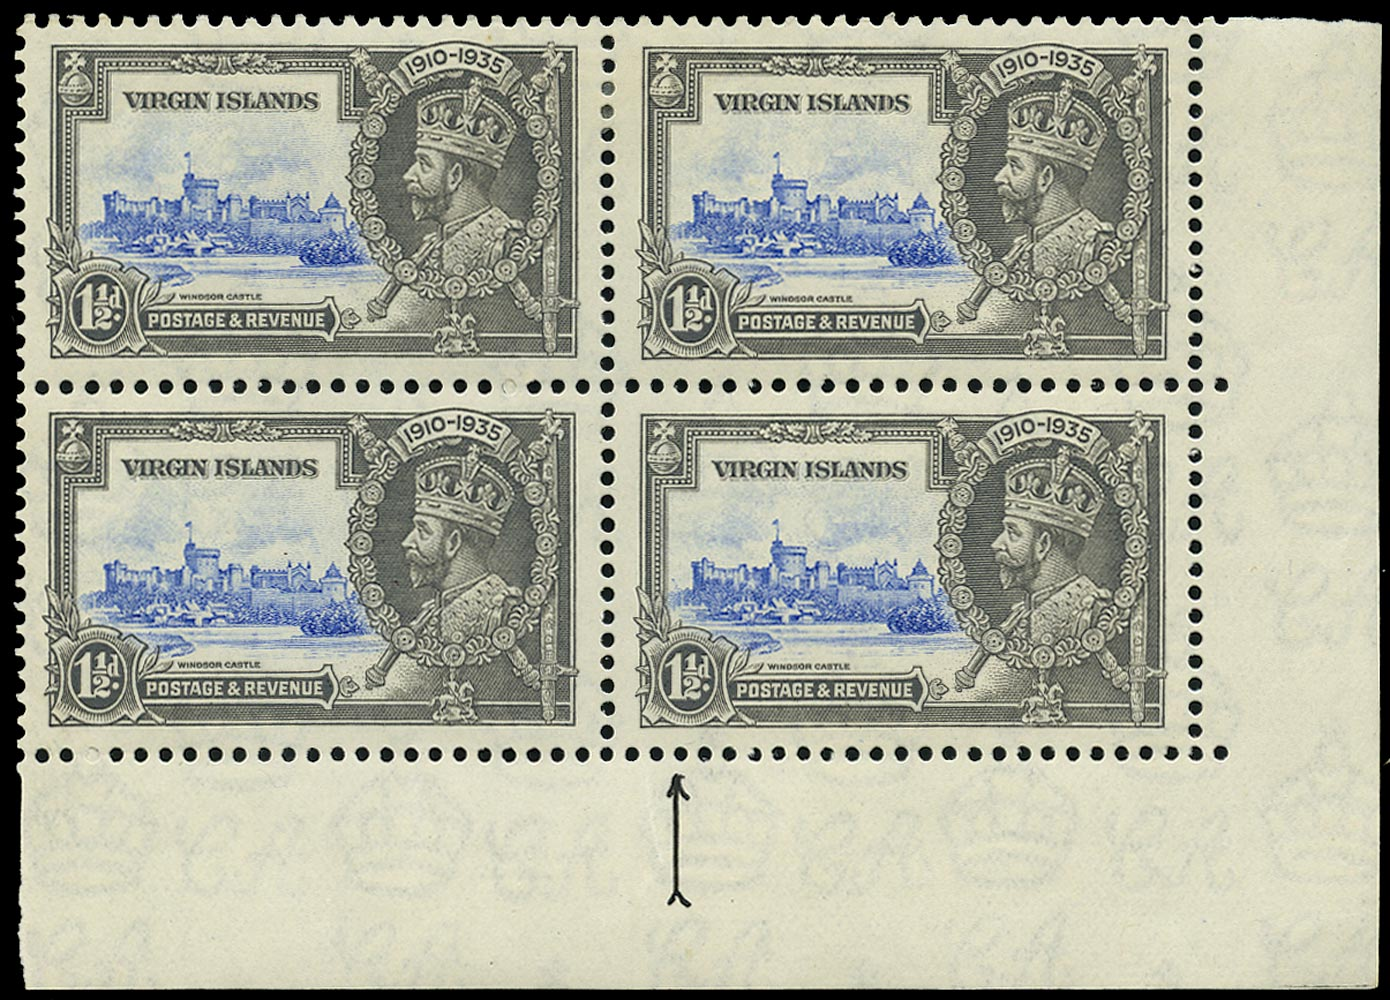 VIRGIN ISLANDS 1935  SG104l Mint Silver Jubilee 1½d ultramarine and grey variety Kite and horizontal log